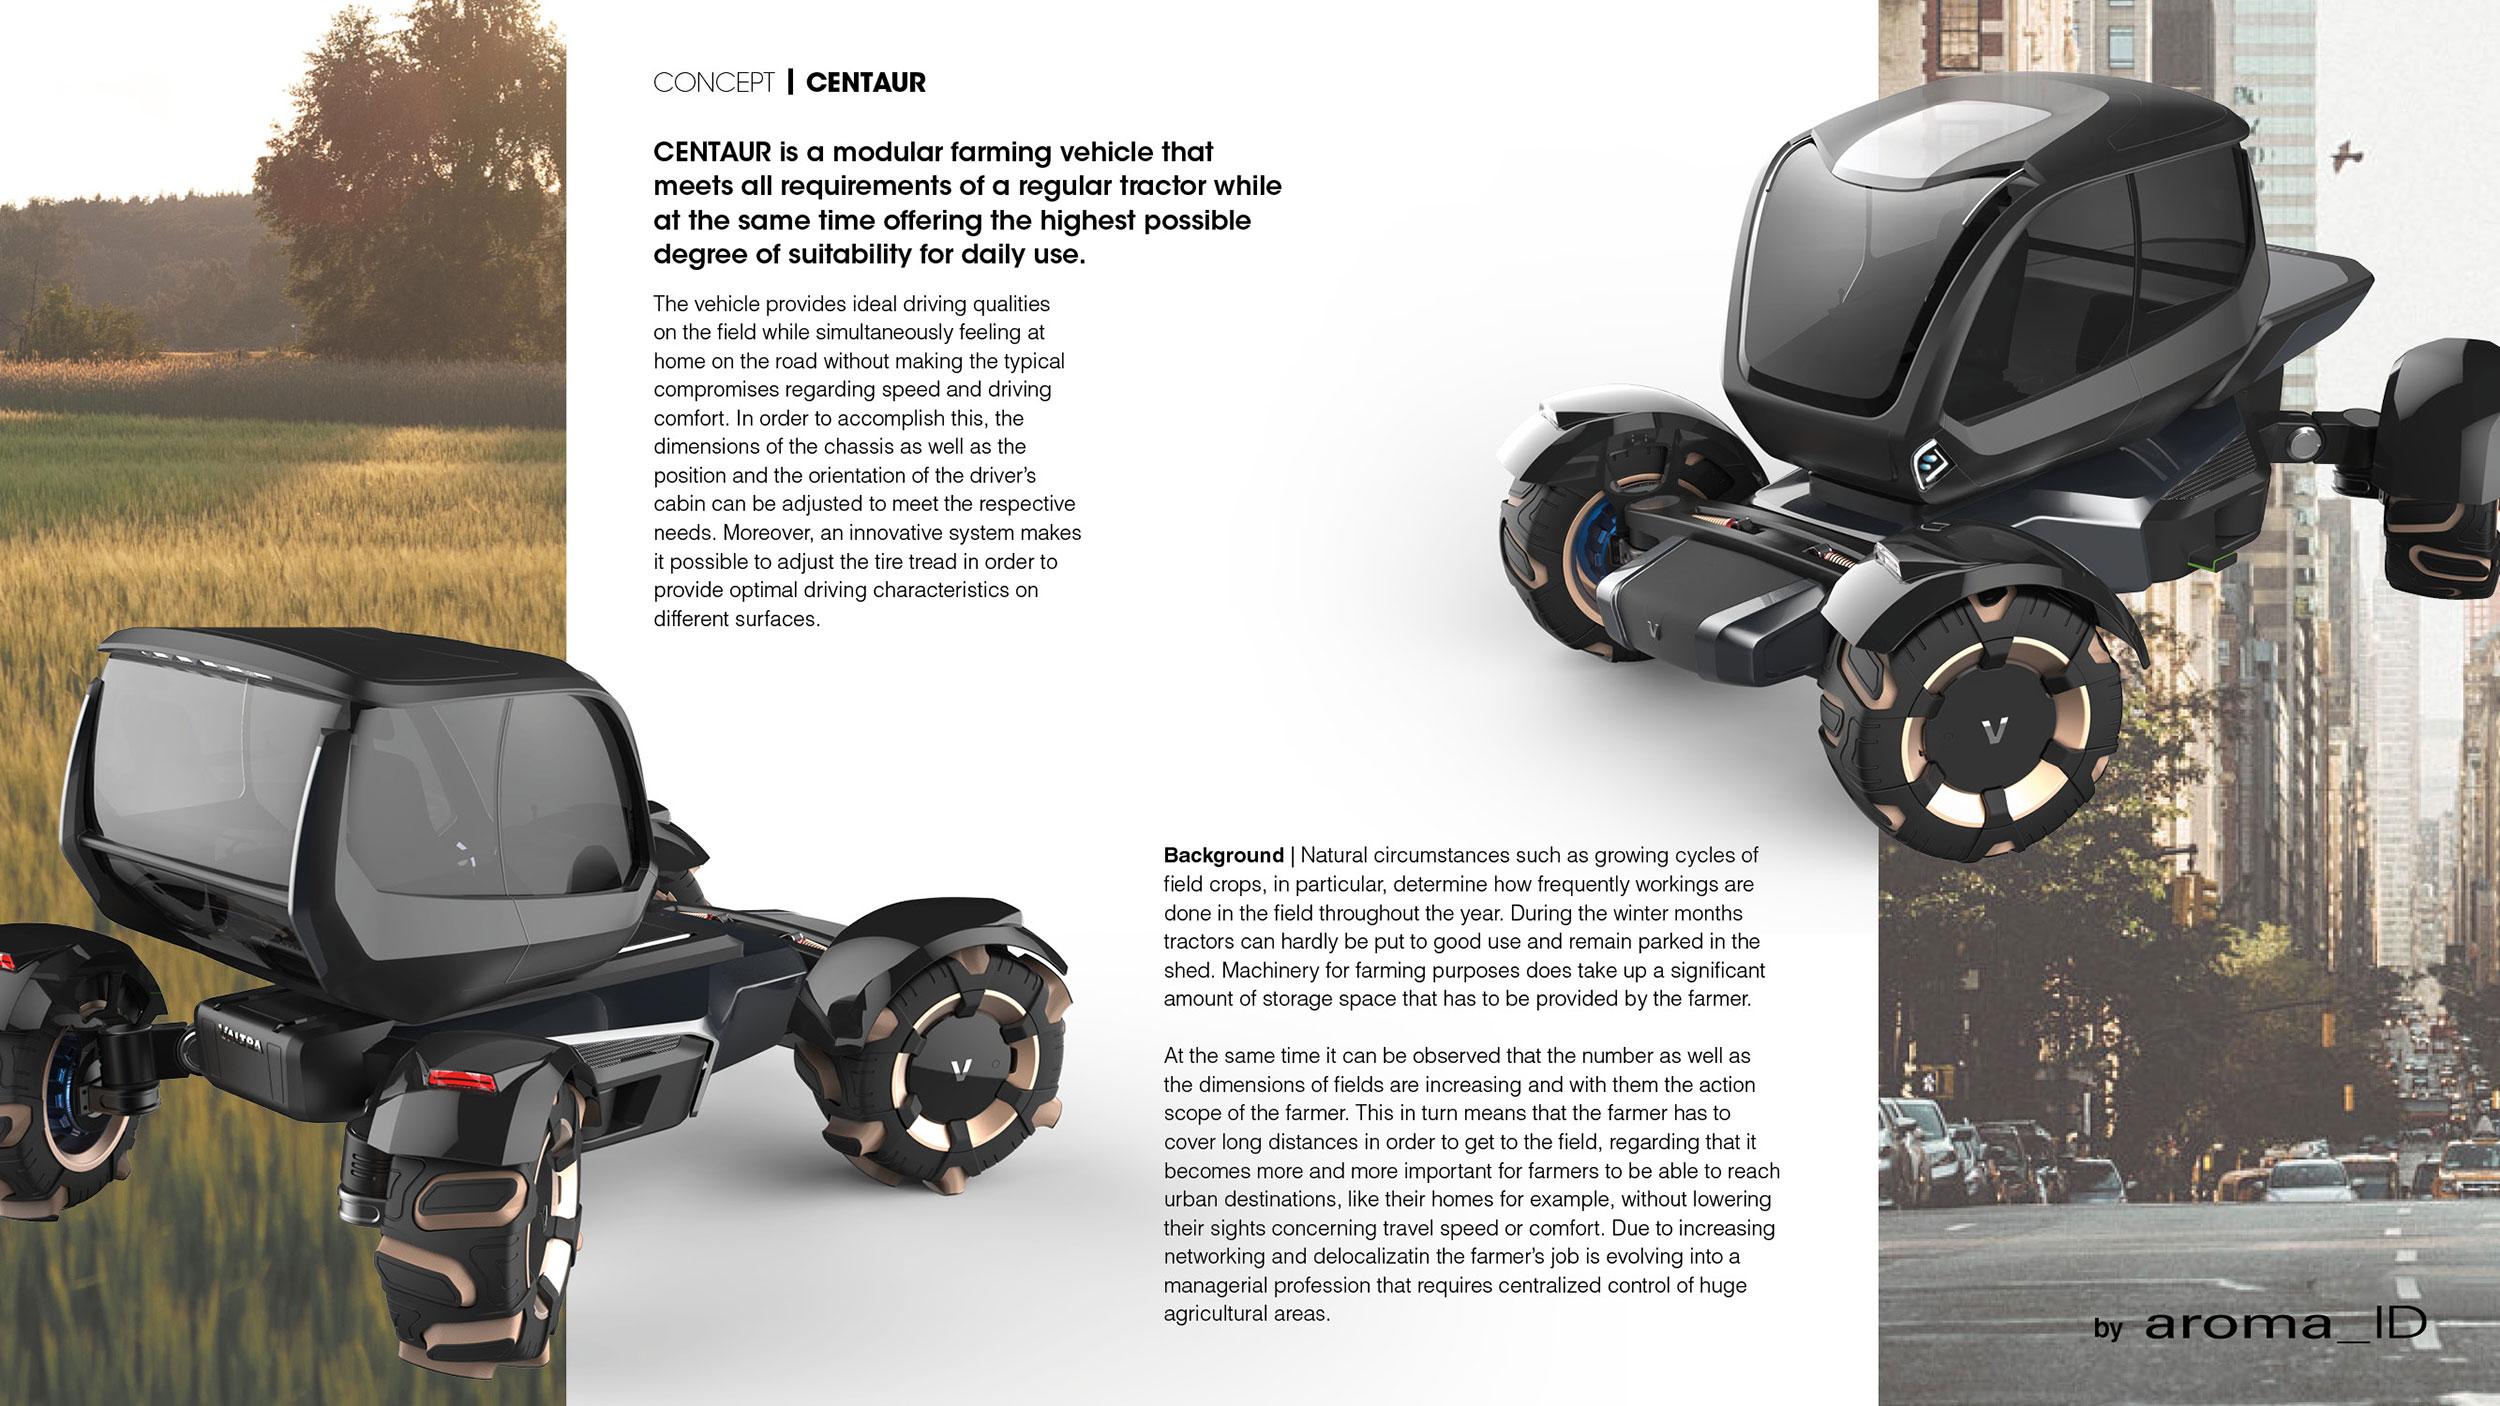 Valtra_Designchallenge_Concept_CENTAUR_by_aroma_ID_2